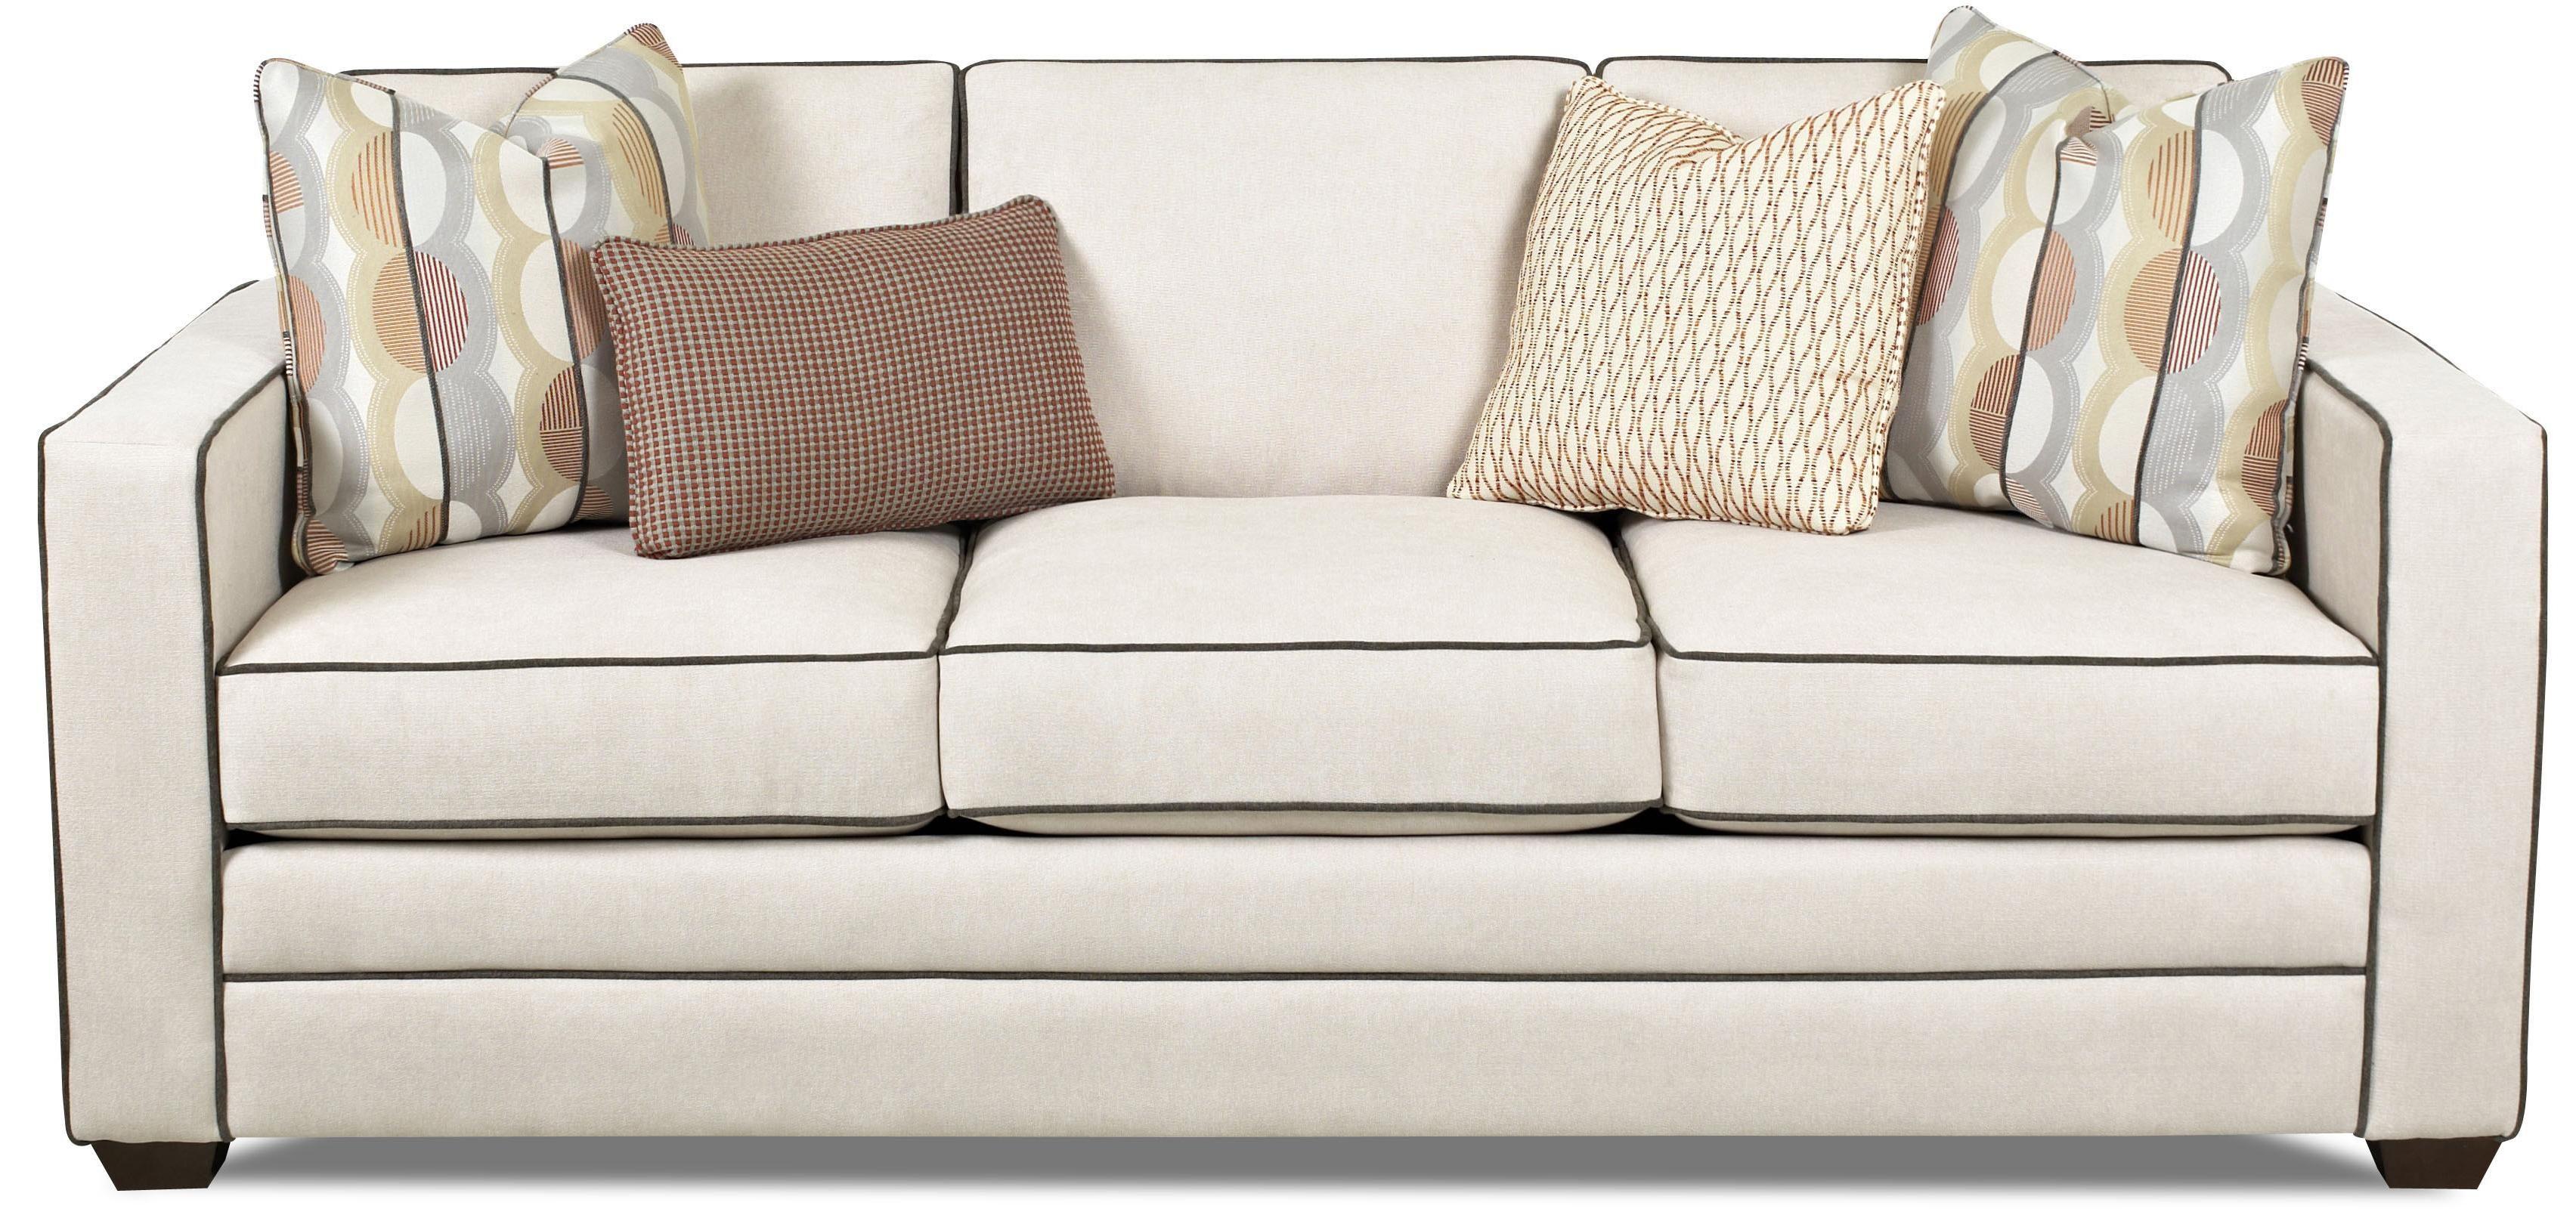 Pilgrim Furniture Sleeper Sofa Patio Ideas